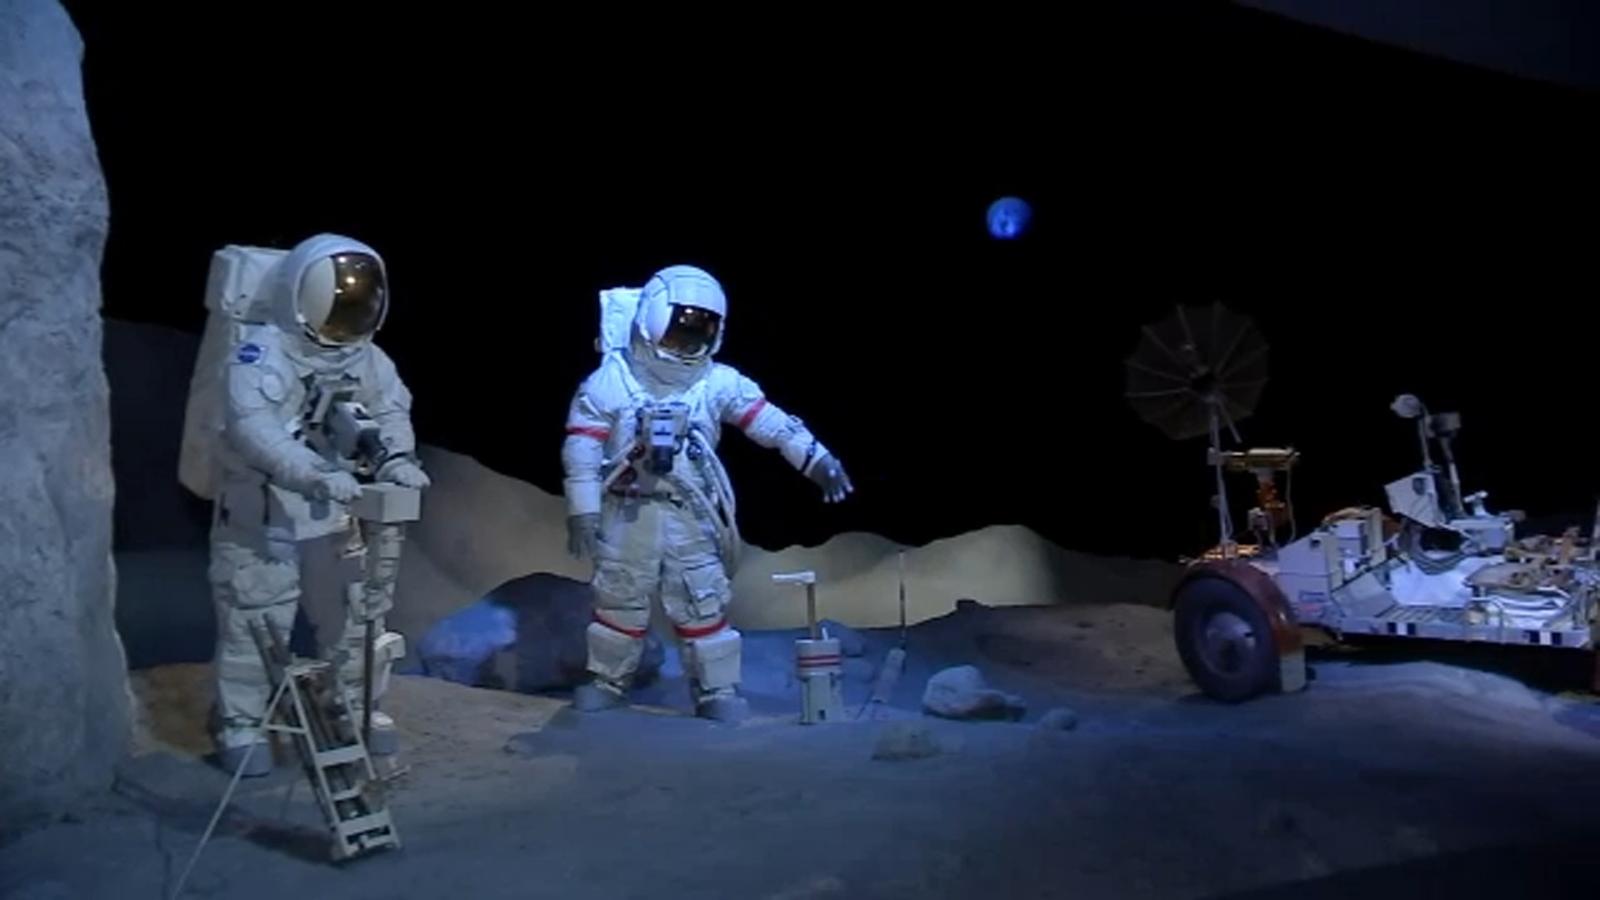 space center houston apollo anniversary - photo #16